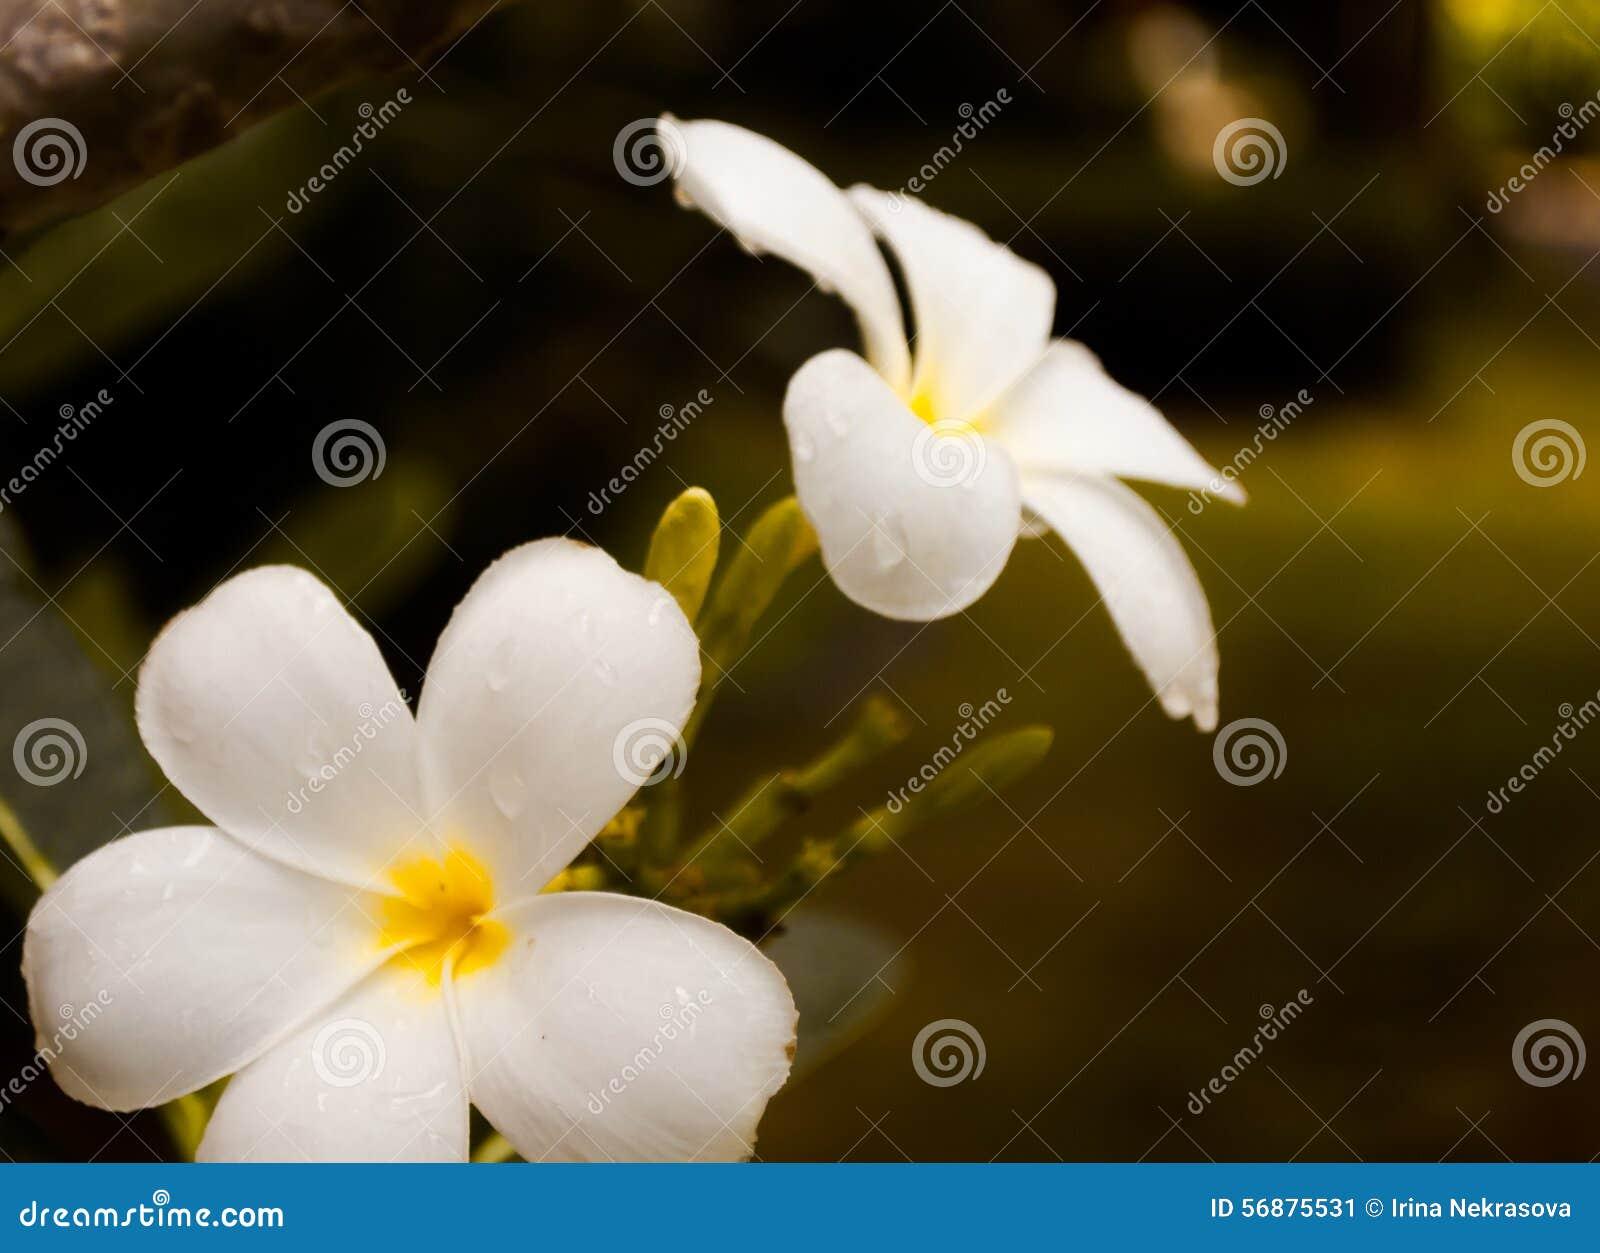 Plumeria de las flores blancas con gota de lluvia